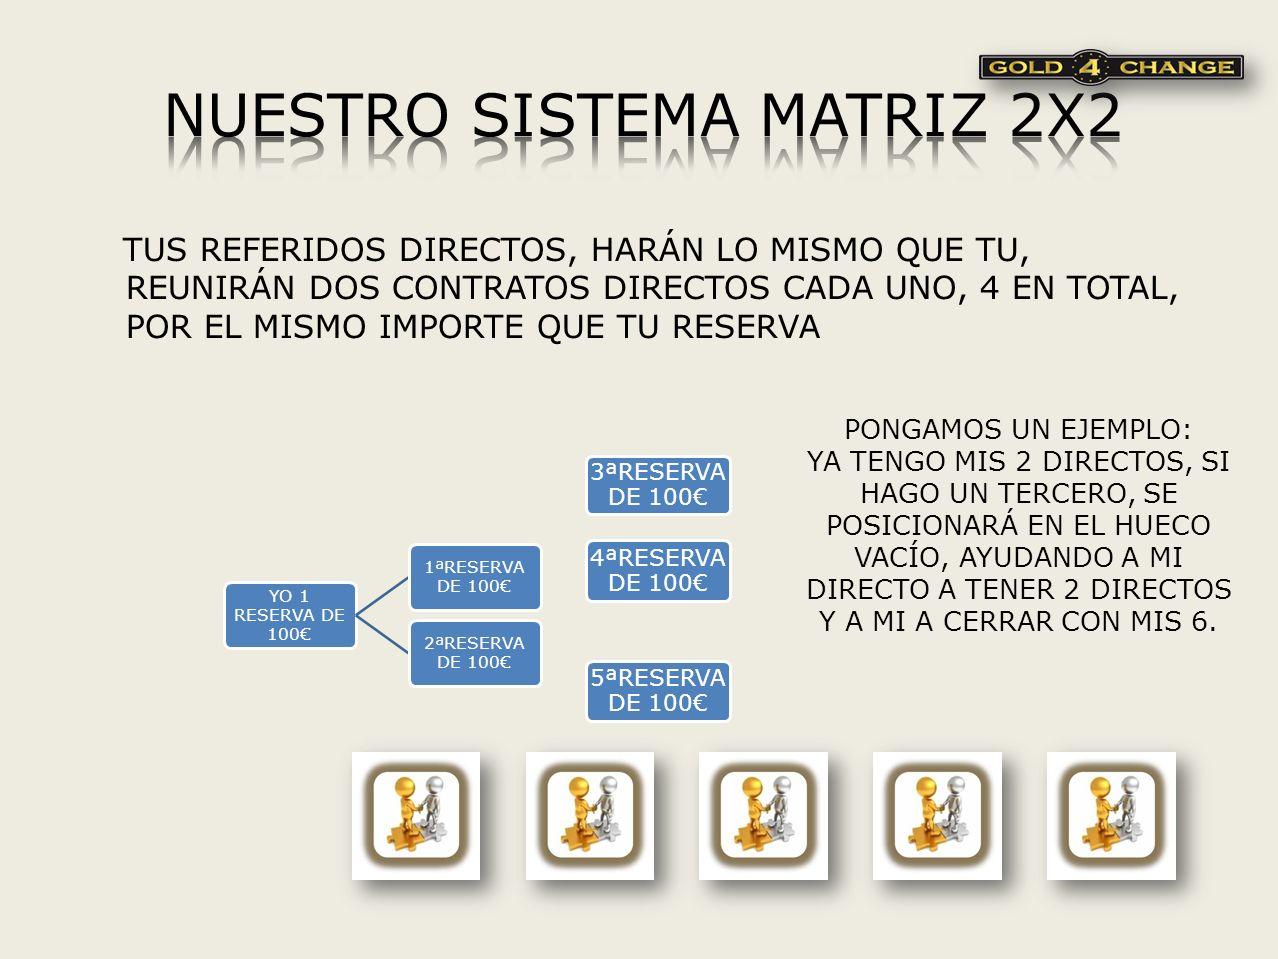 NUESTRO SISTEMA MATRIZ 2X2